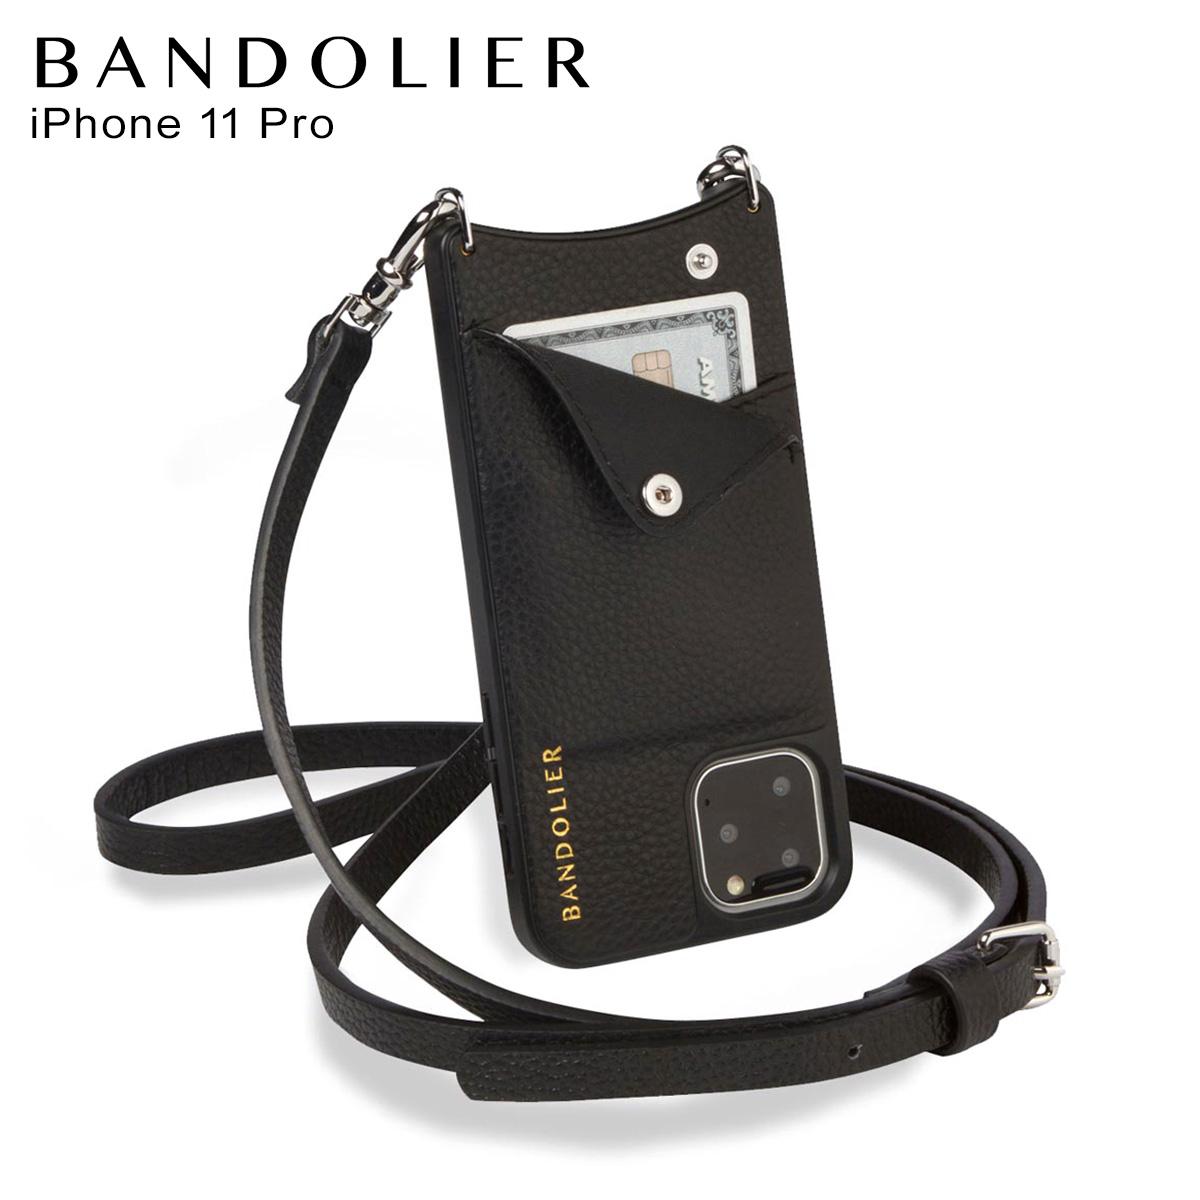 BANDOLIER EMMA SILVER バンドリヤー エマ シルバー iPhone11 Pro ケース スマホ 携帯 ショルダー アイフォン メンズ レディース ブラック 黒 2910